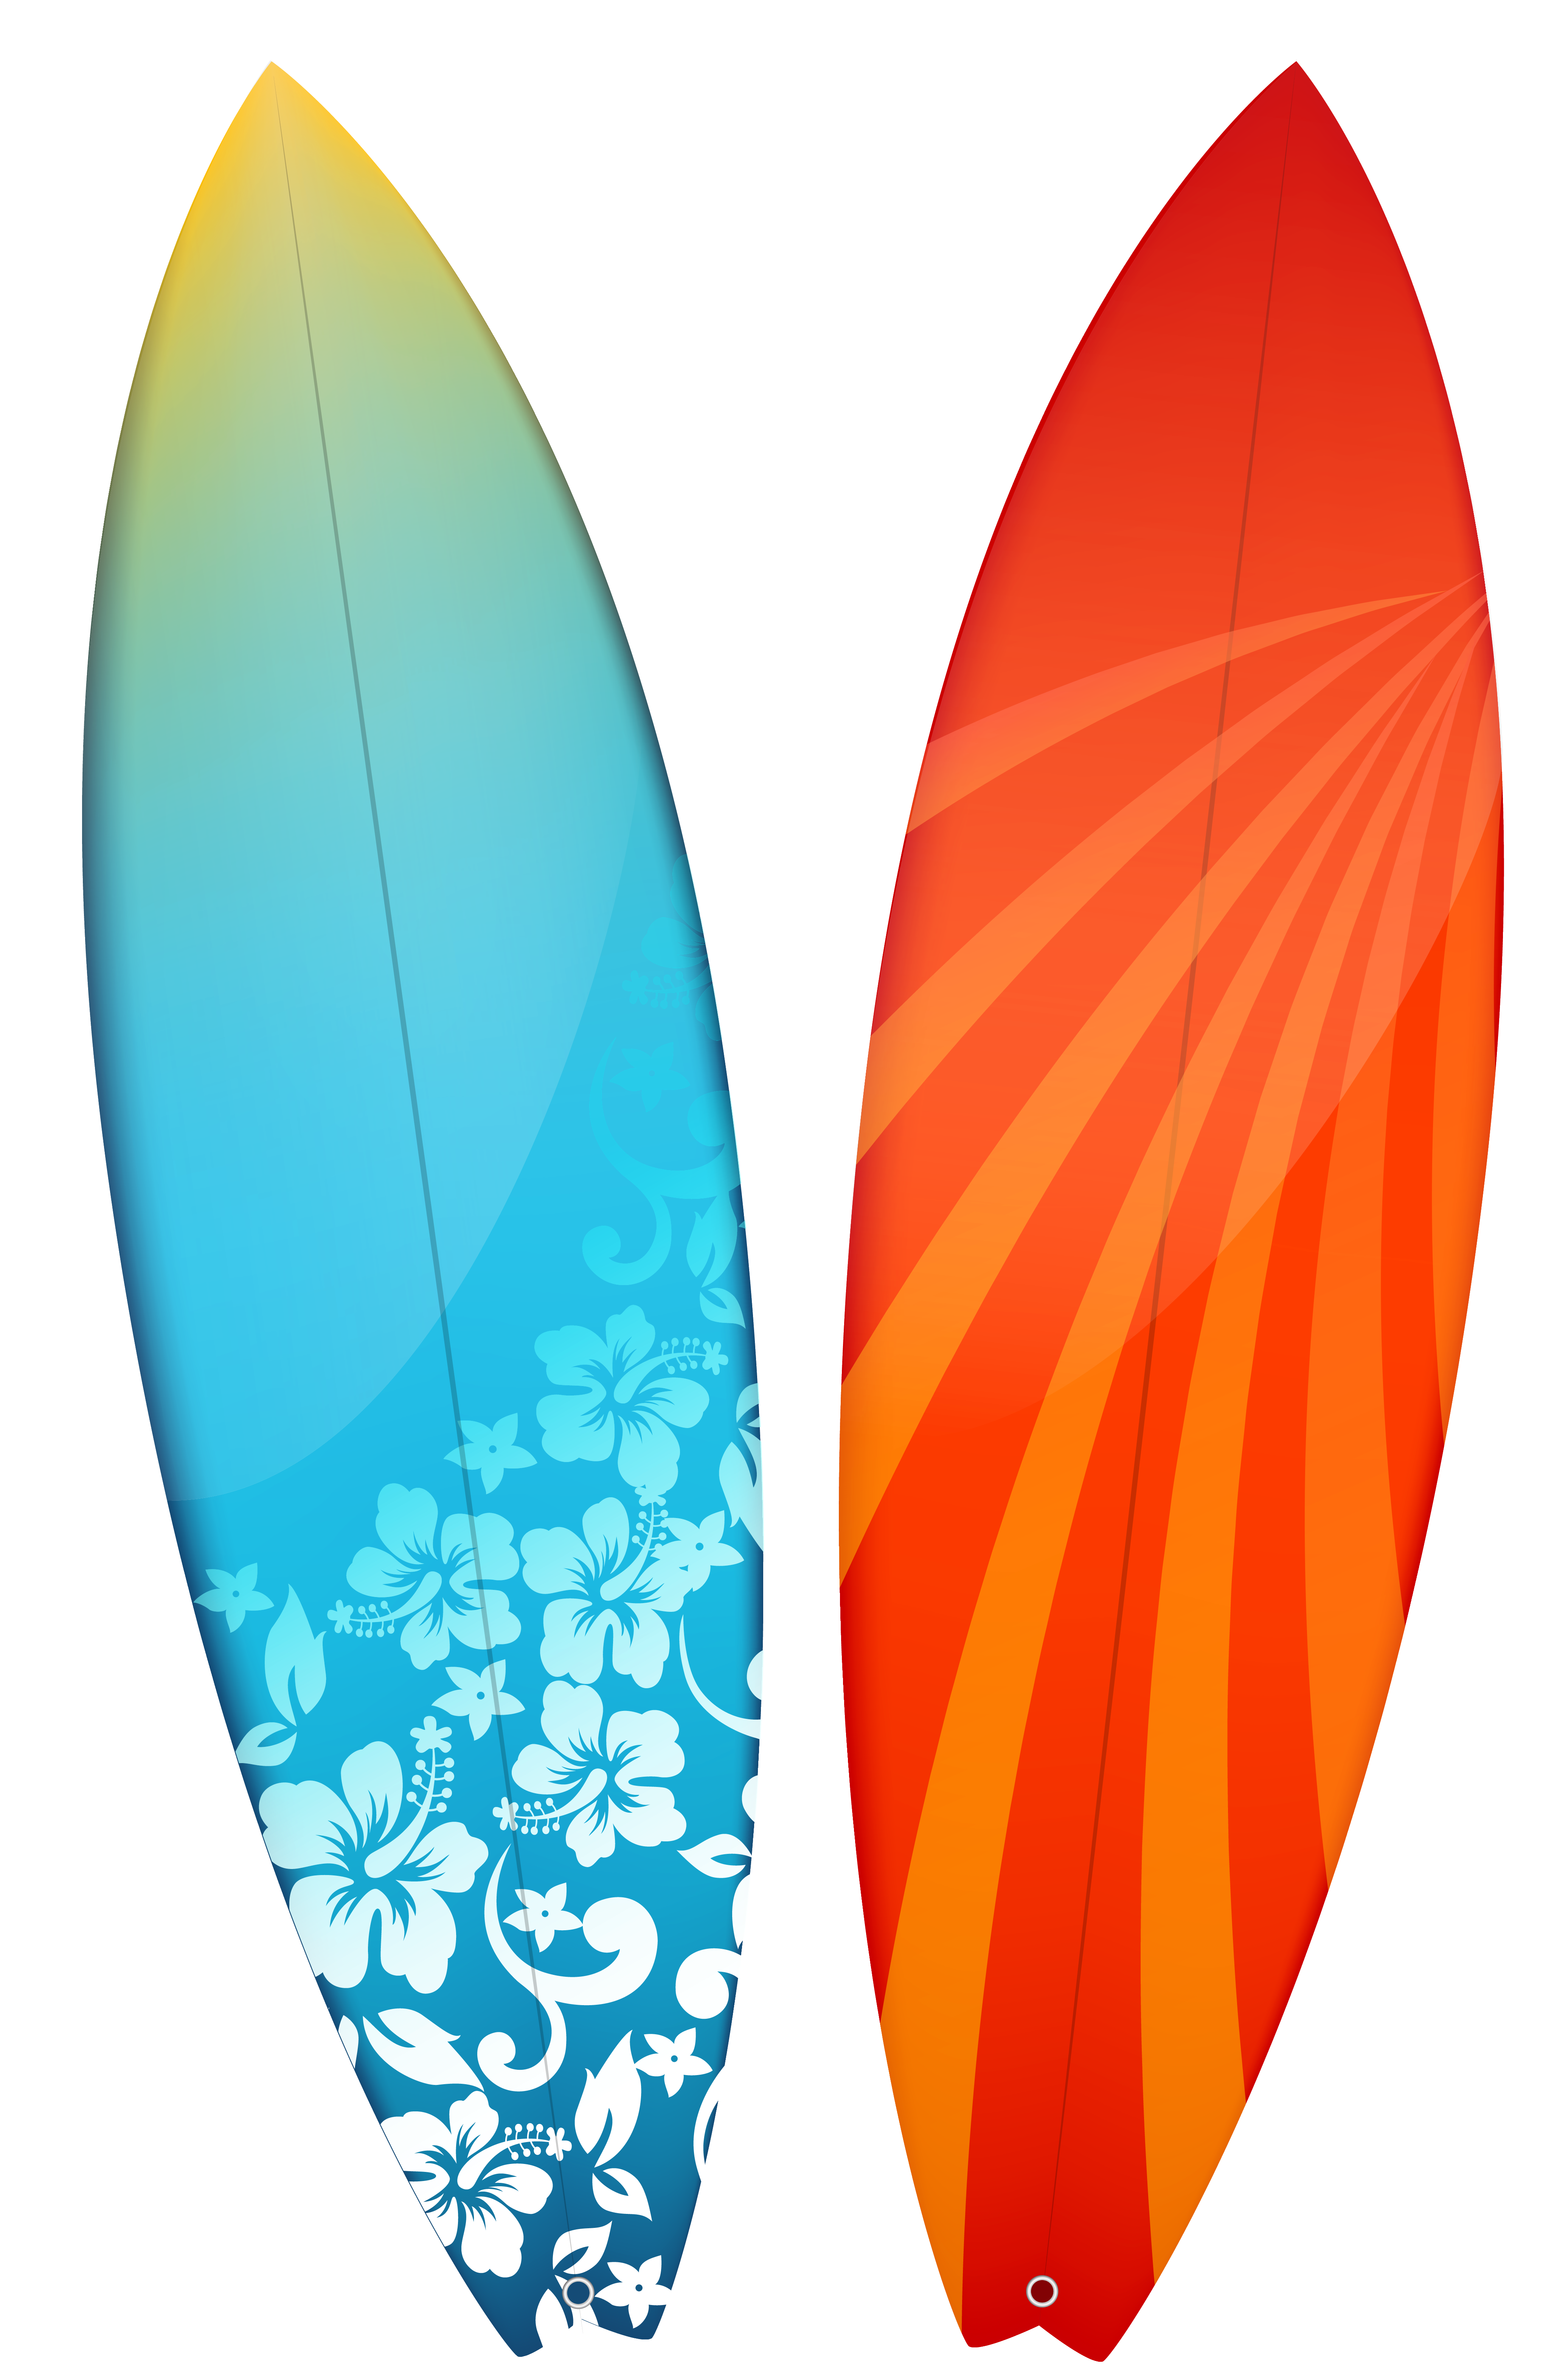 Surfboards Clipart Image-Surfboards clipart image-11